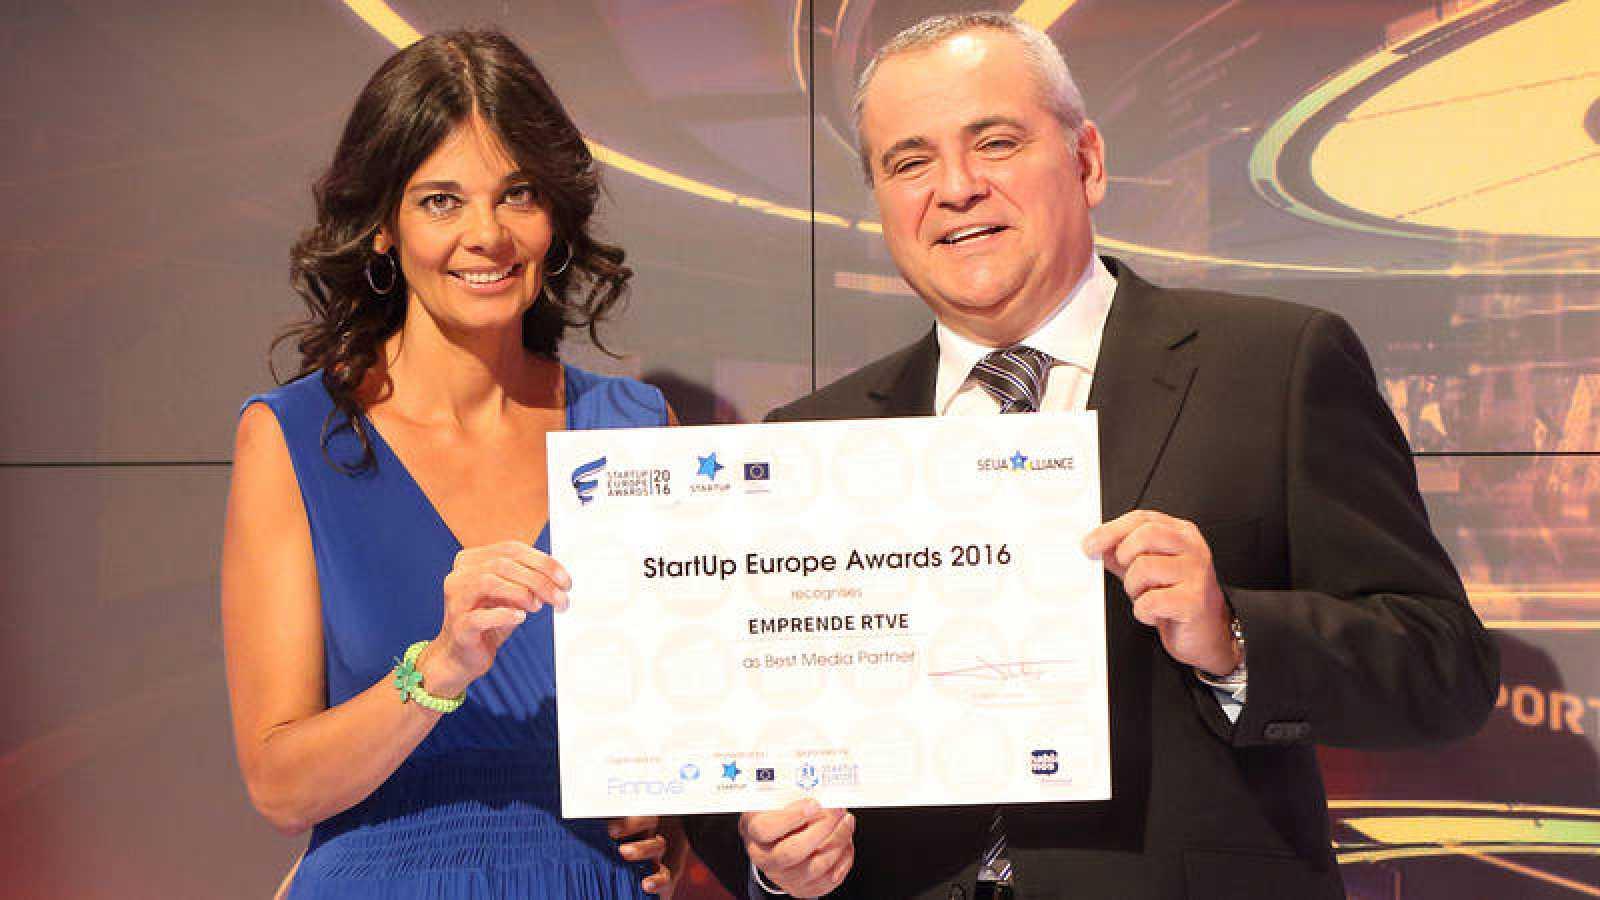 Premio StartUp Europe Awards